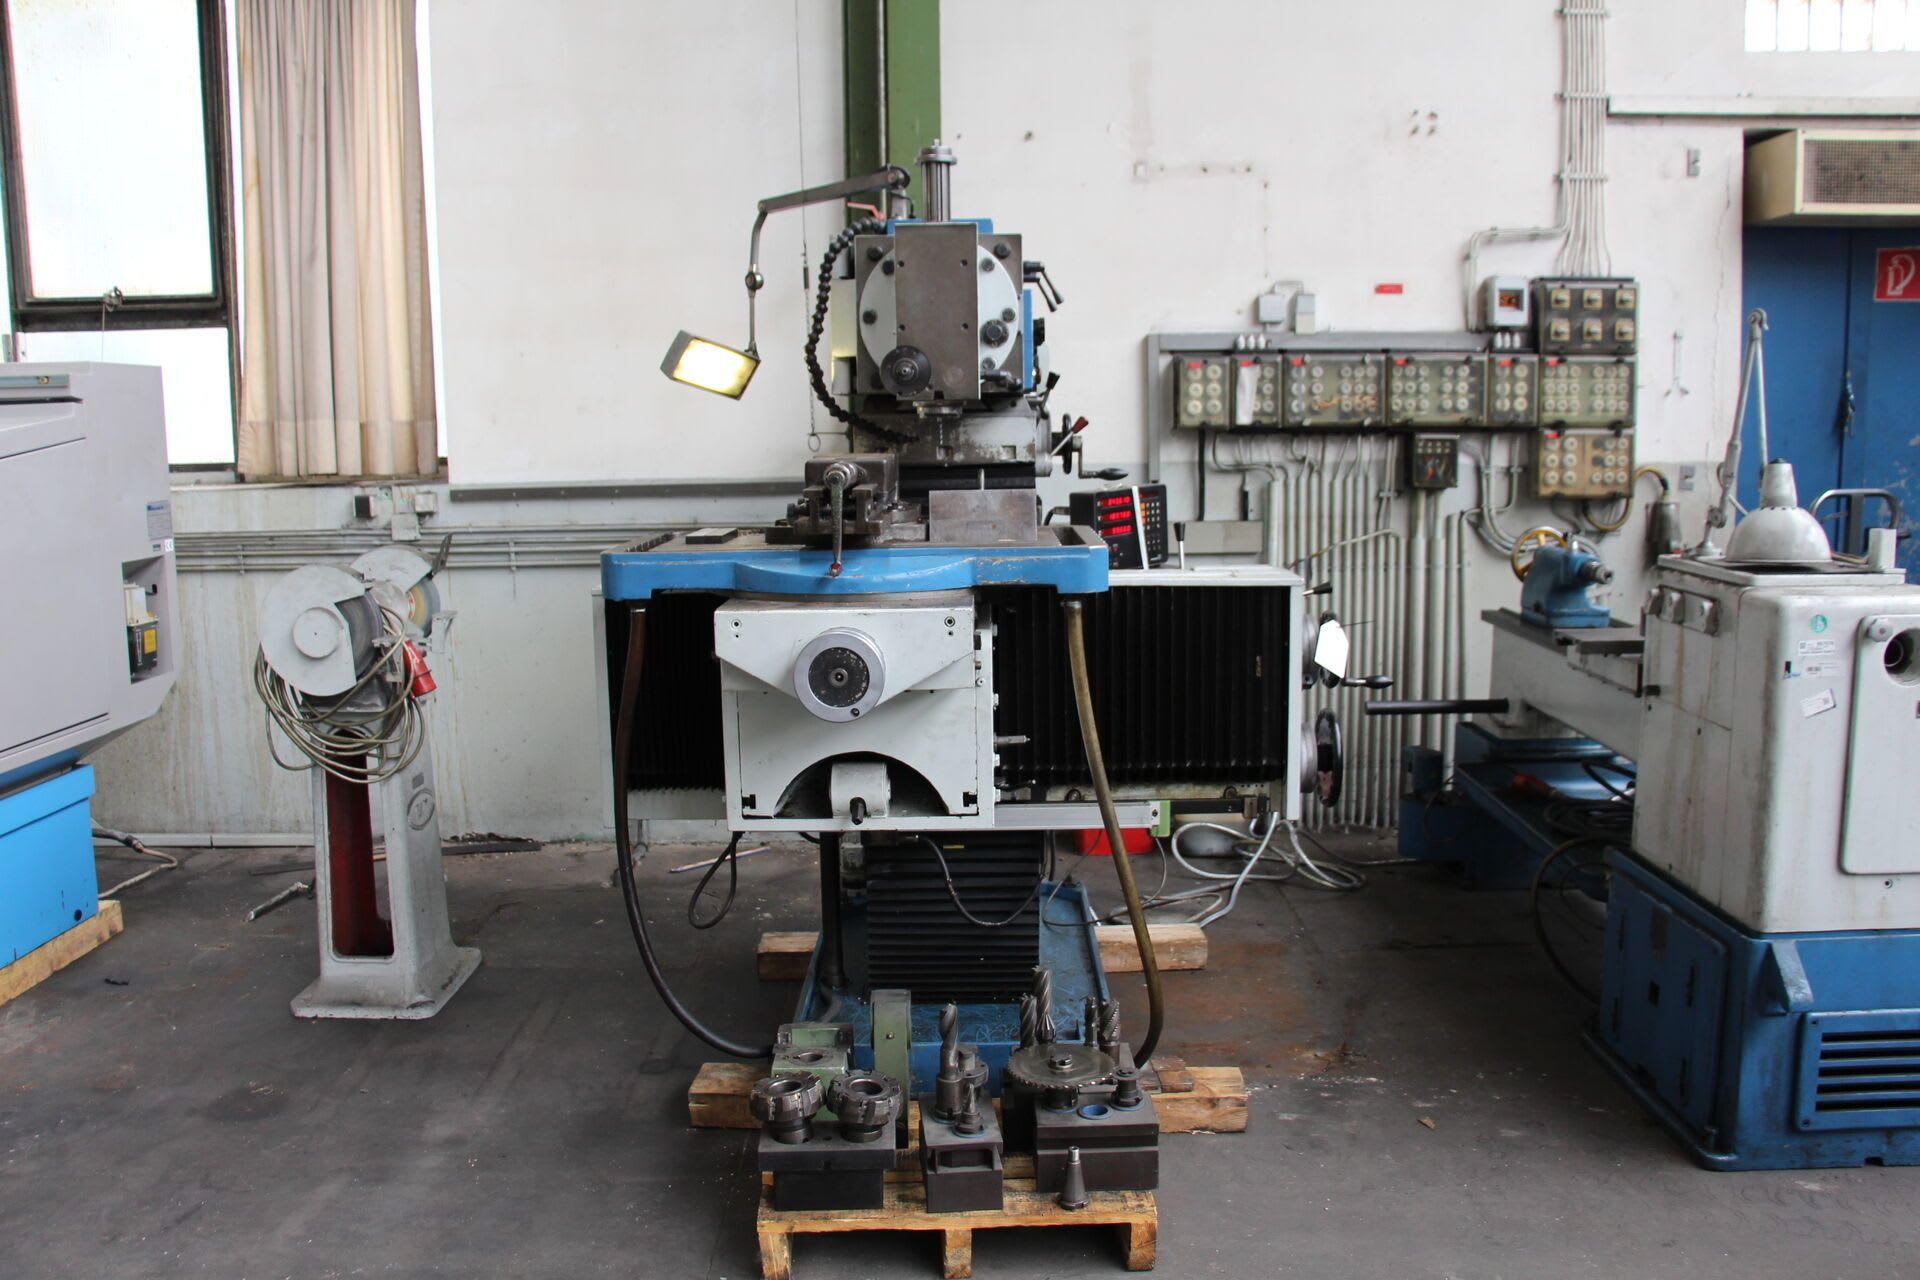 MAHO MH 800 Evrenselfräsmaschine